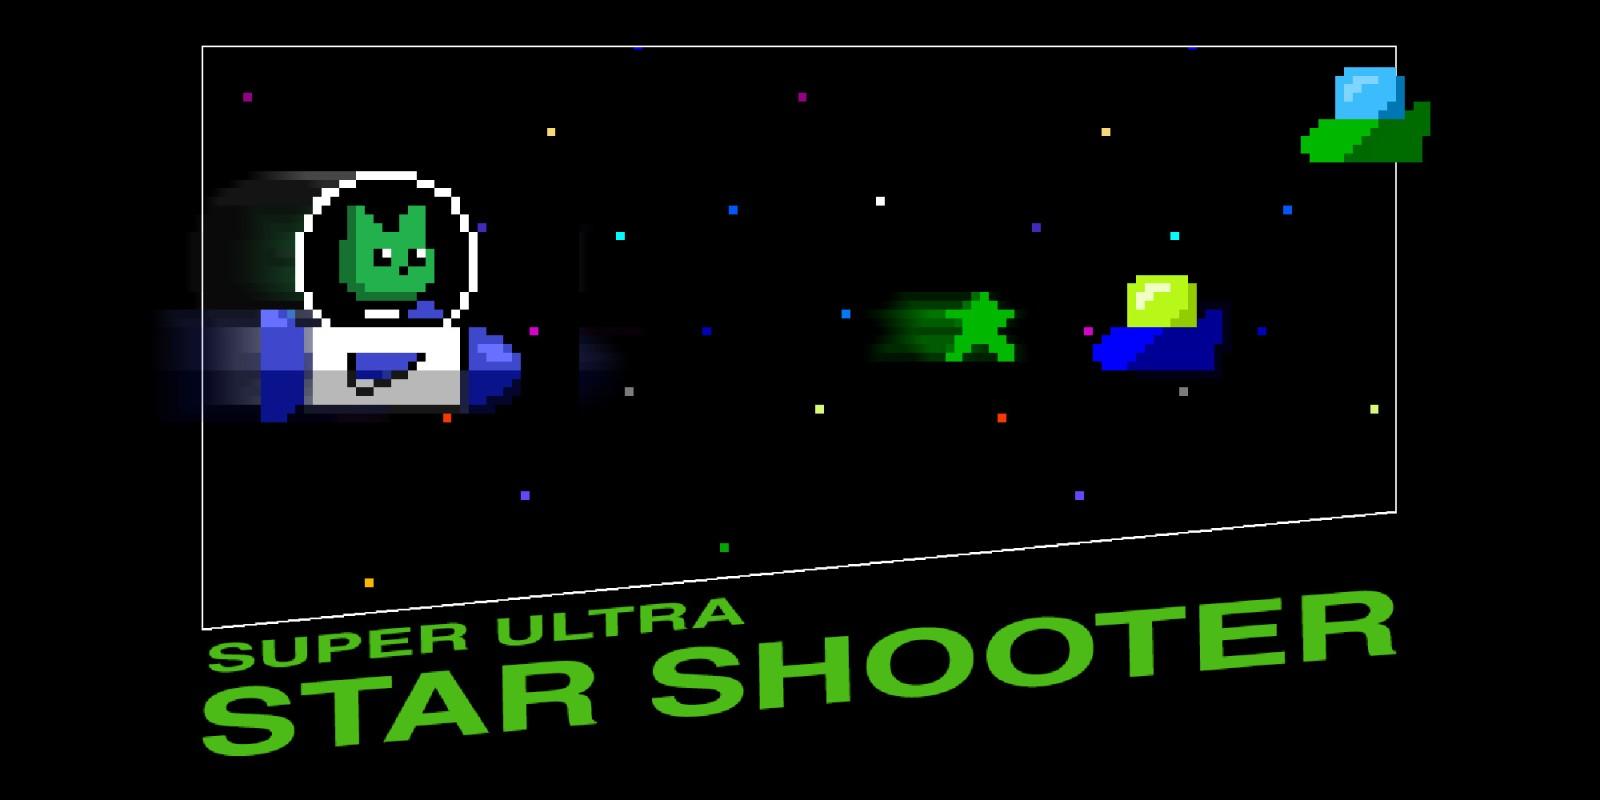 Wii U Downloadable Games : Super ultra star shooter wii u download software games